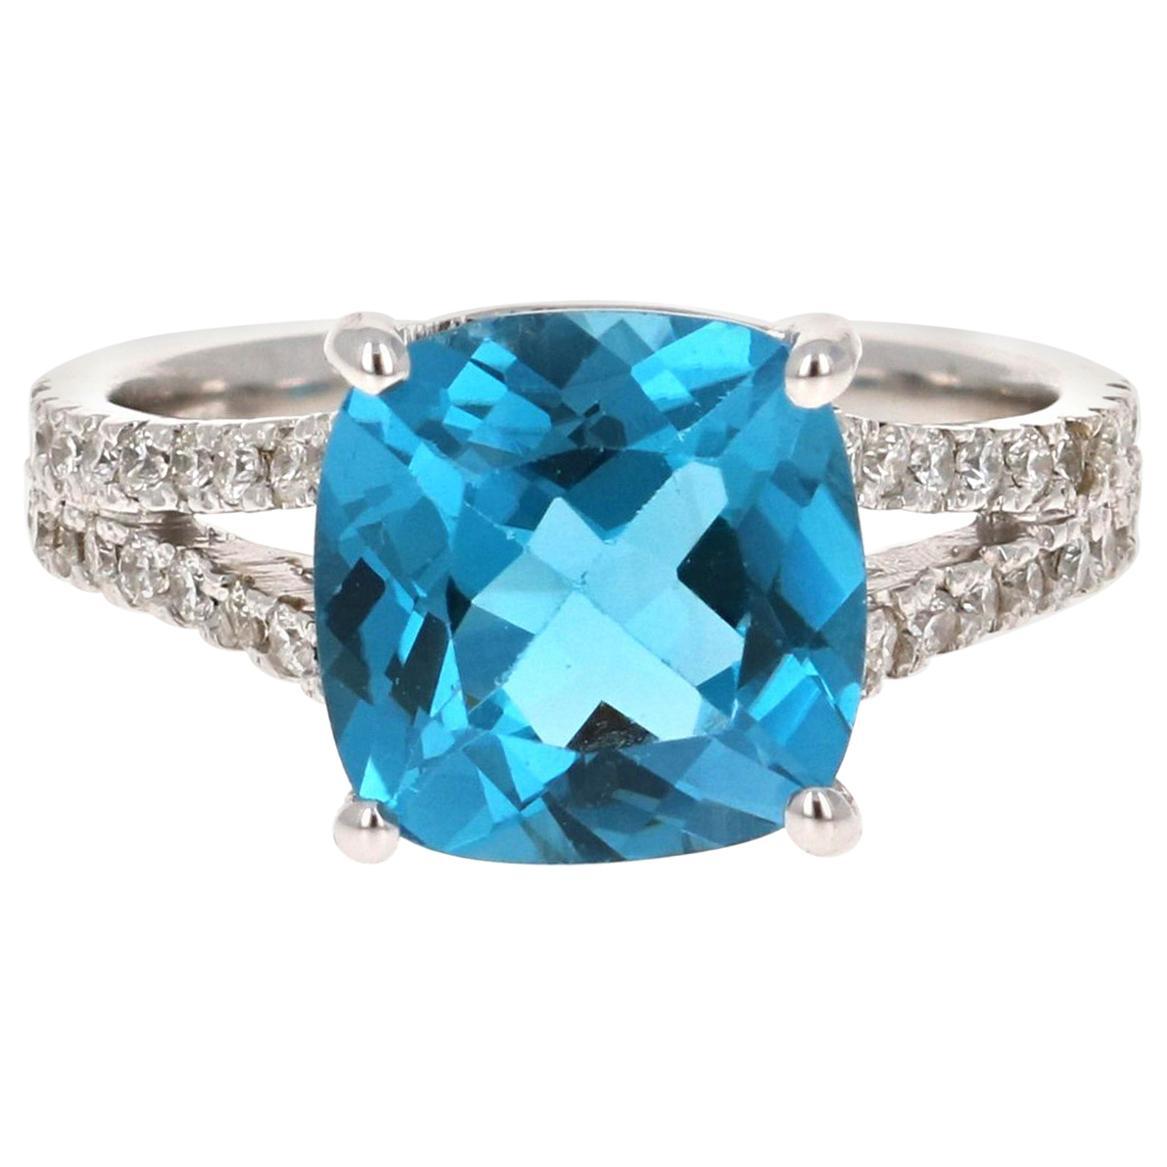 5.08 Carat Cushion Cut Blue Topaz Diamond 14 Karat White Gold Ring